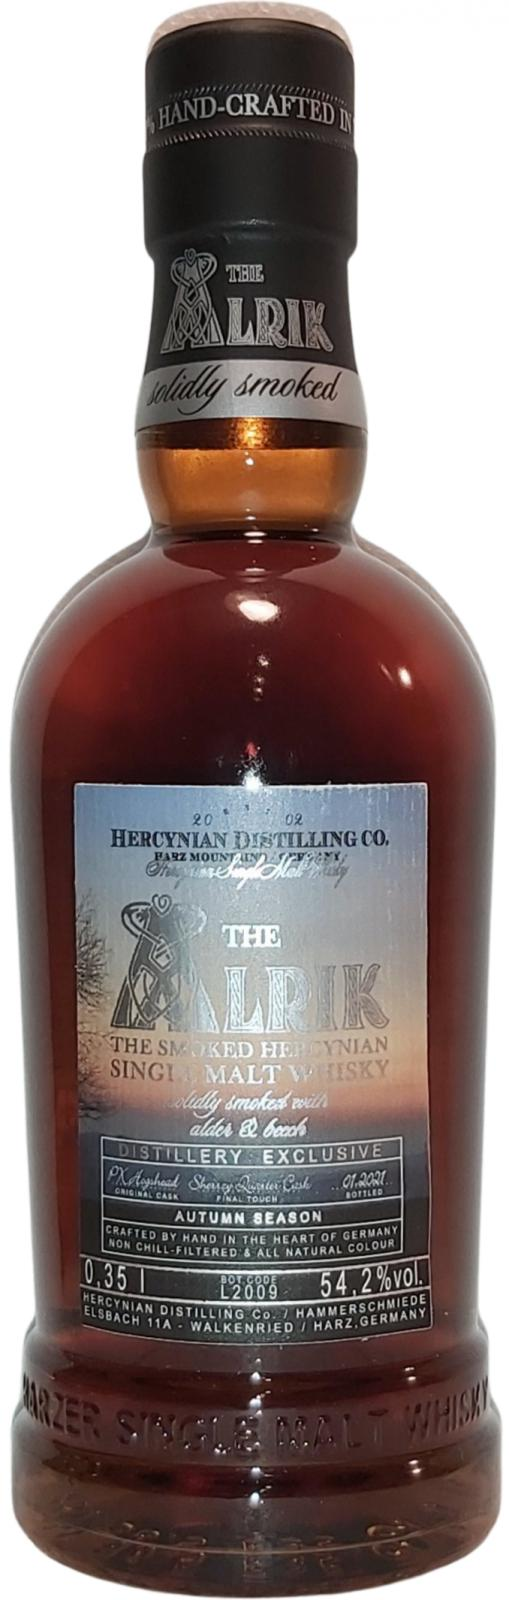 The Alrik 4 Seasons - Distillery Exclusive